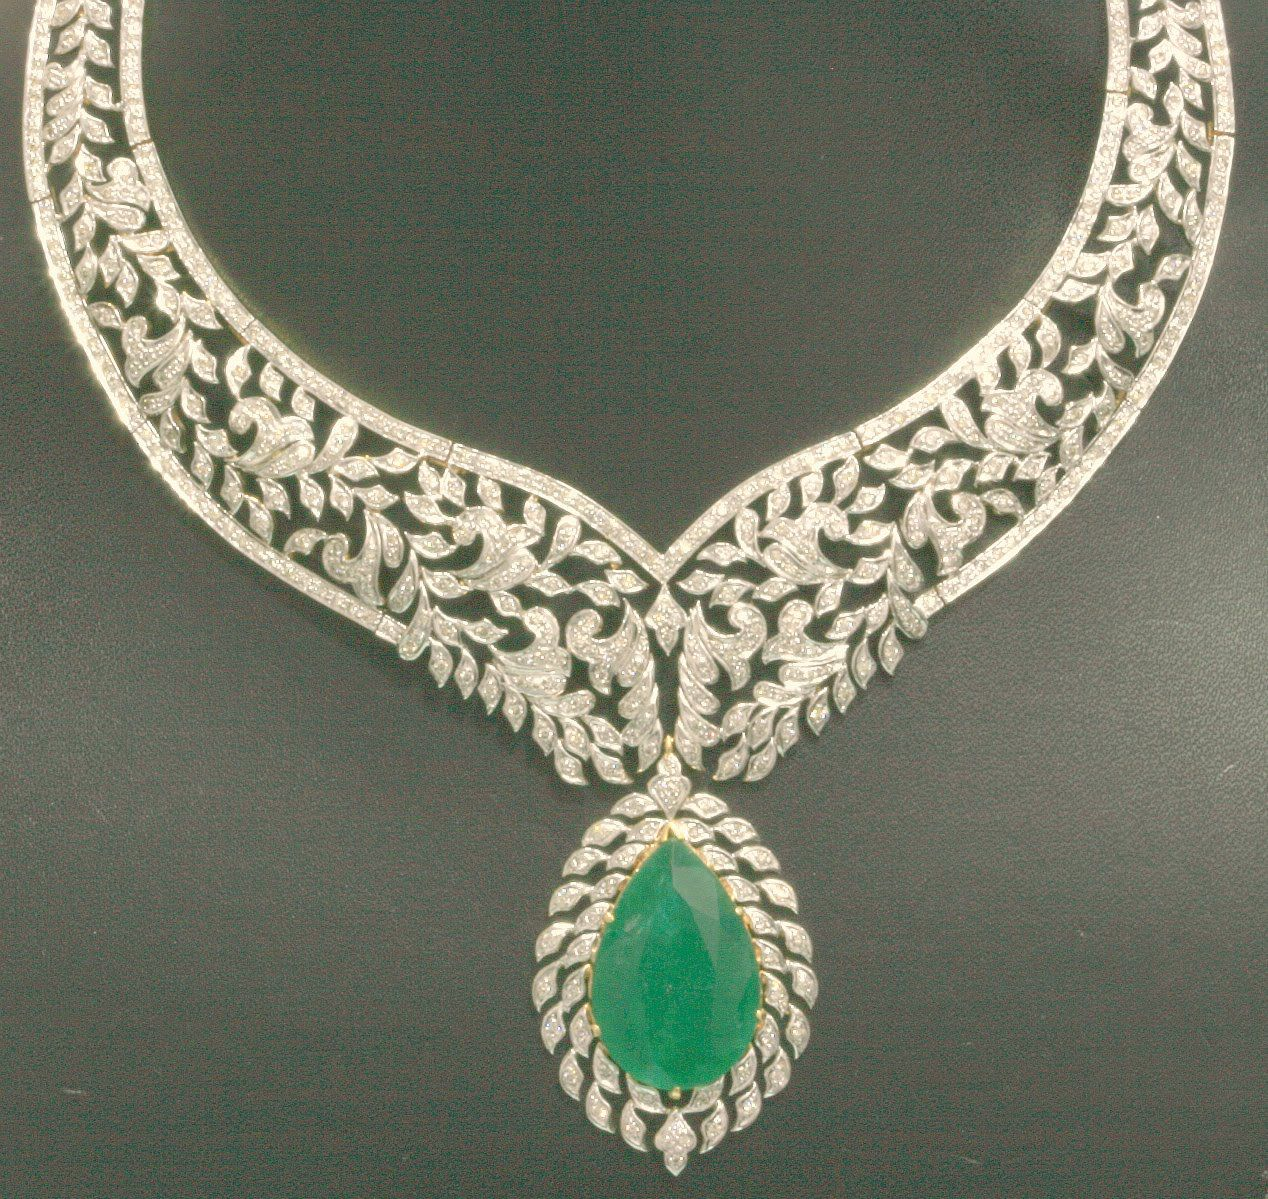 Elegant Diamond Necklace Designs Types of diamond necklaces